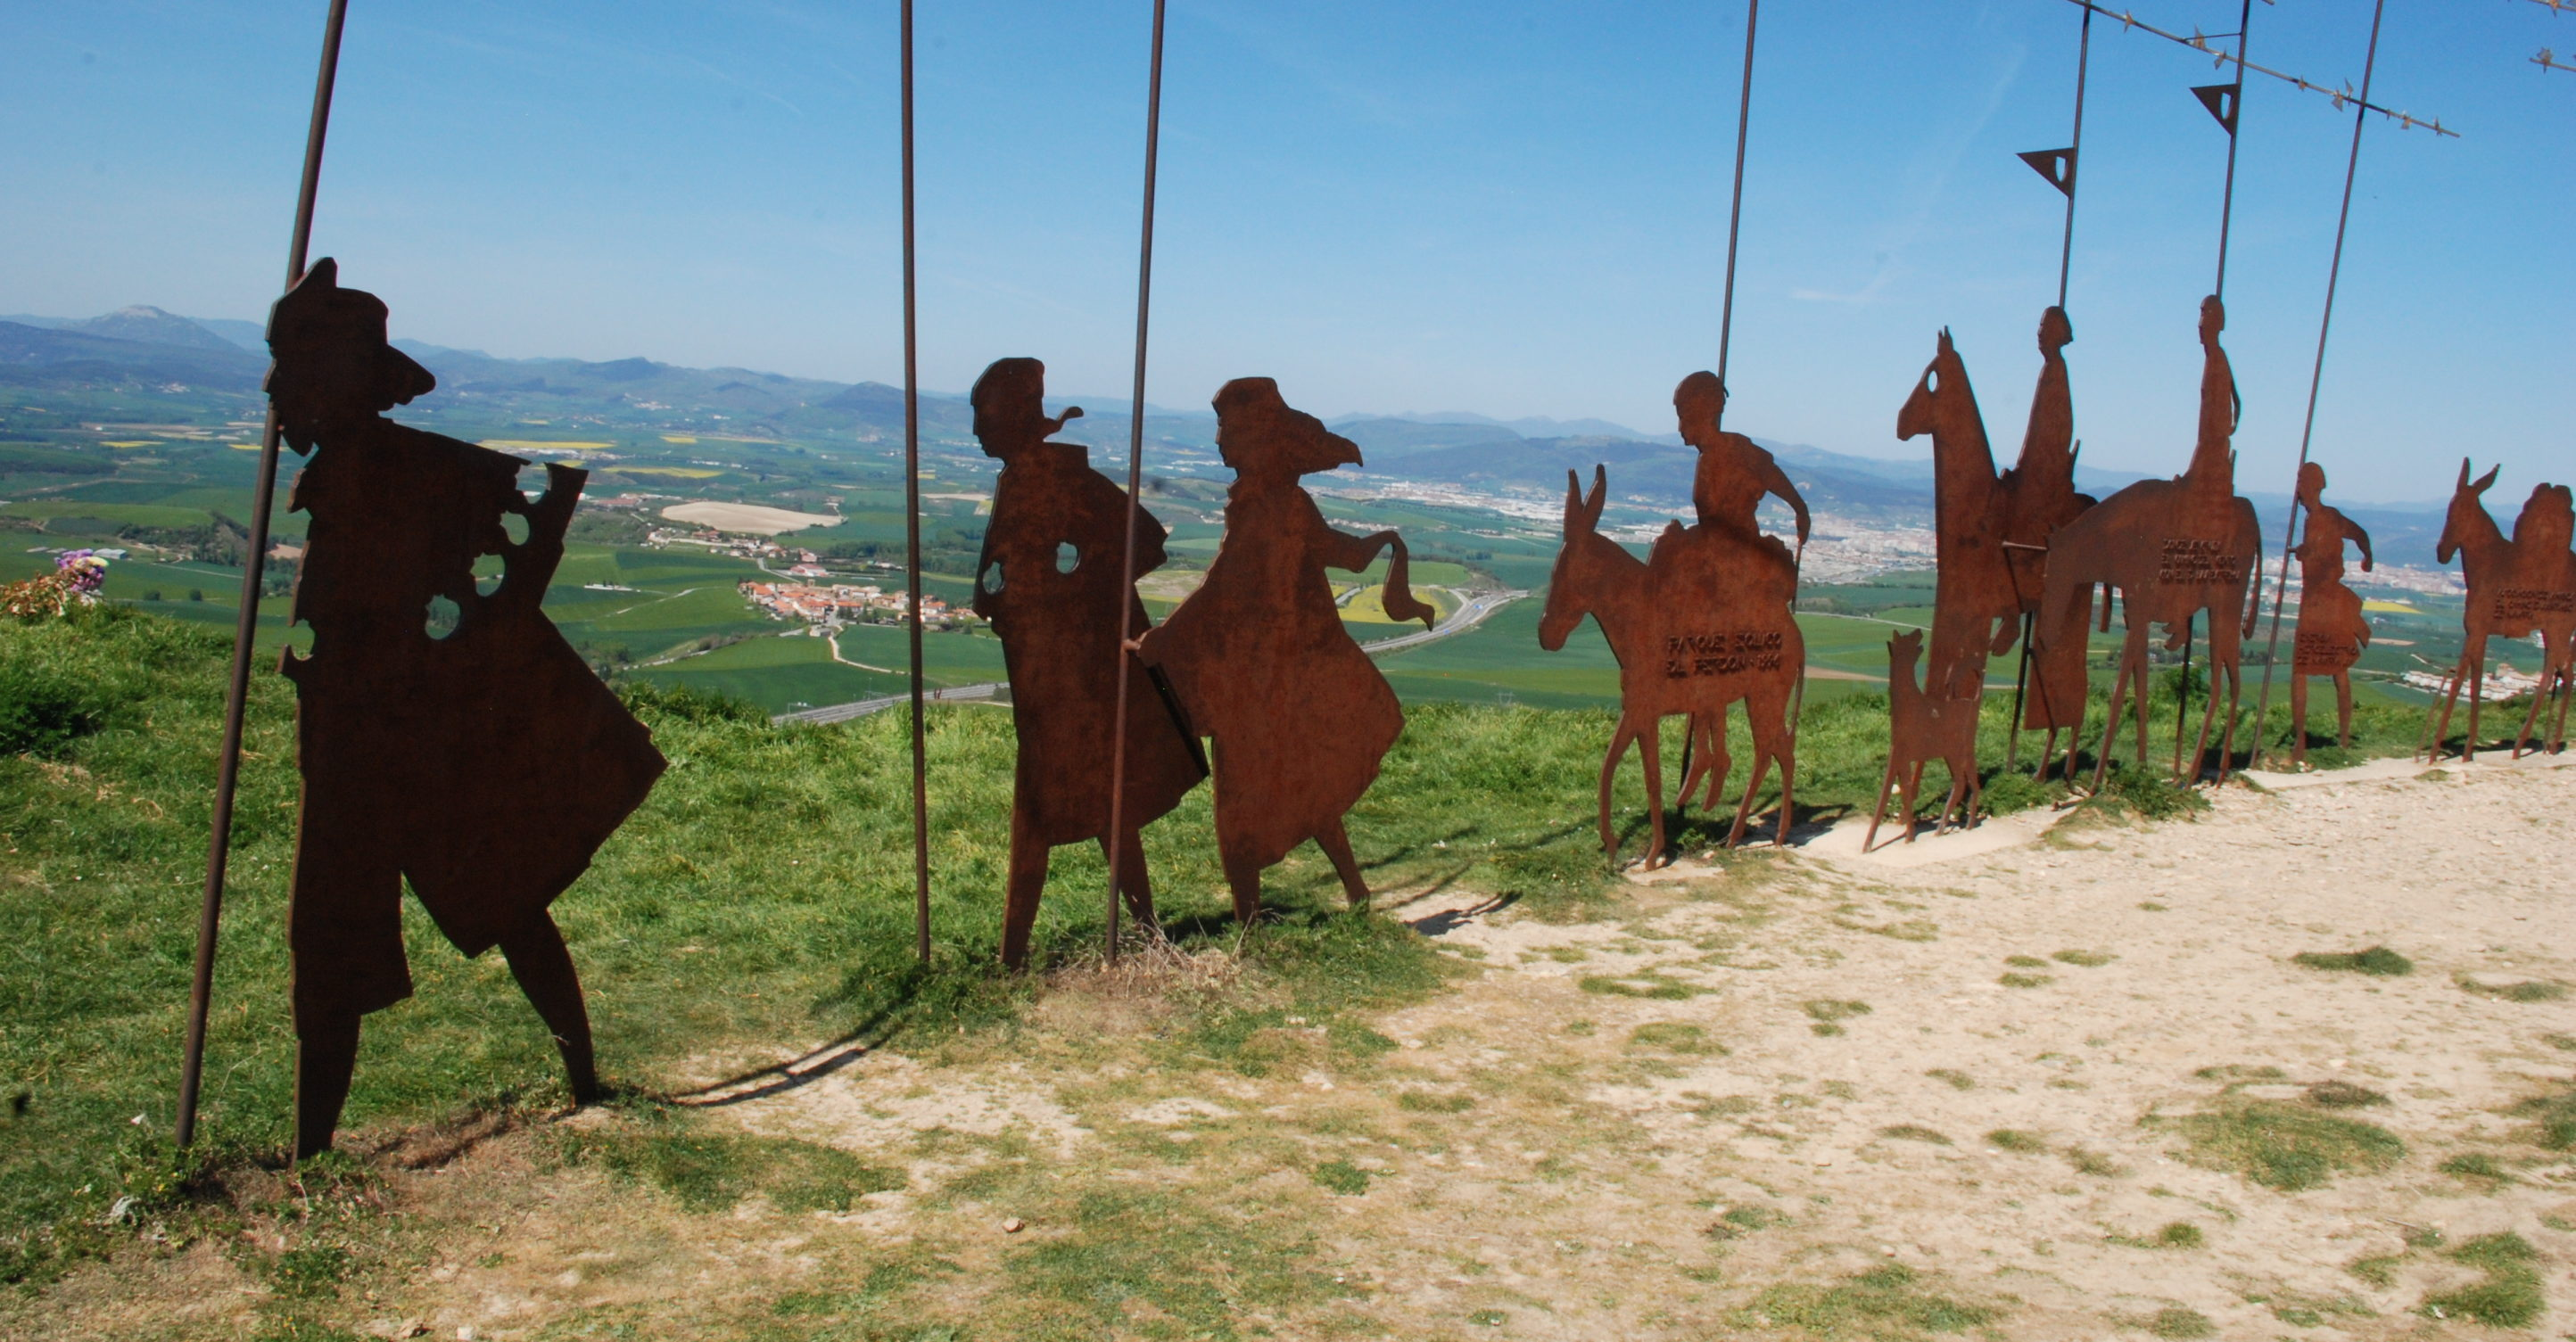 Pilgrim statue on Alto del Perdón, Navarra, Spain.